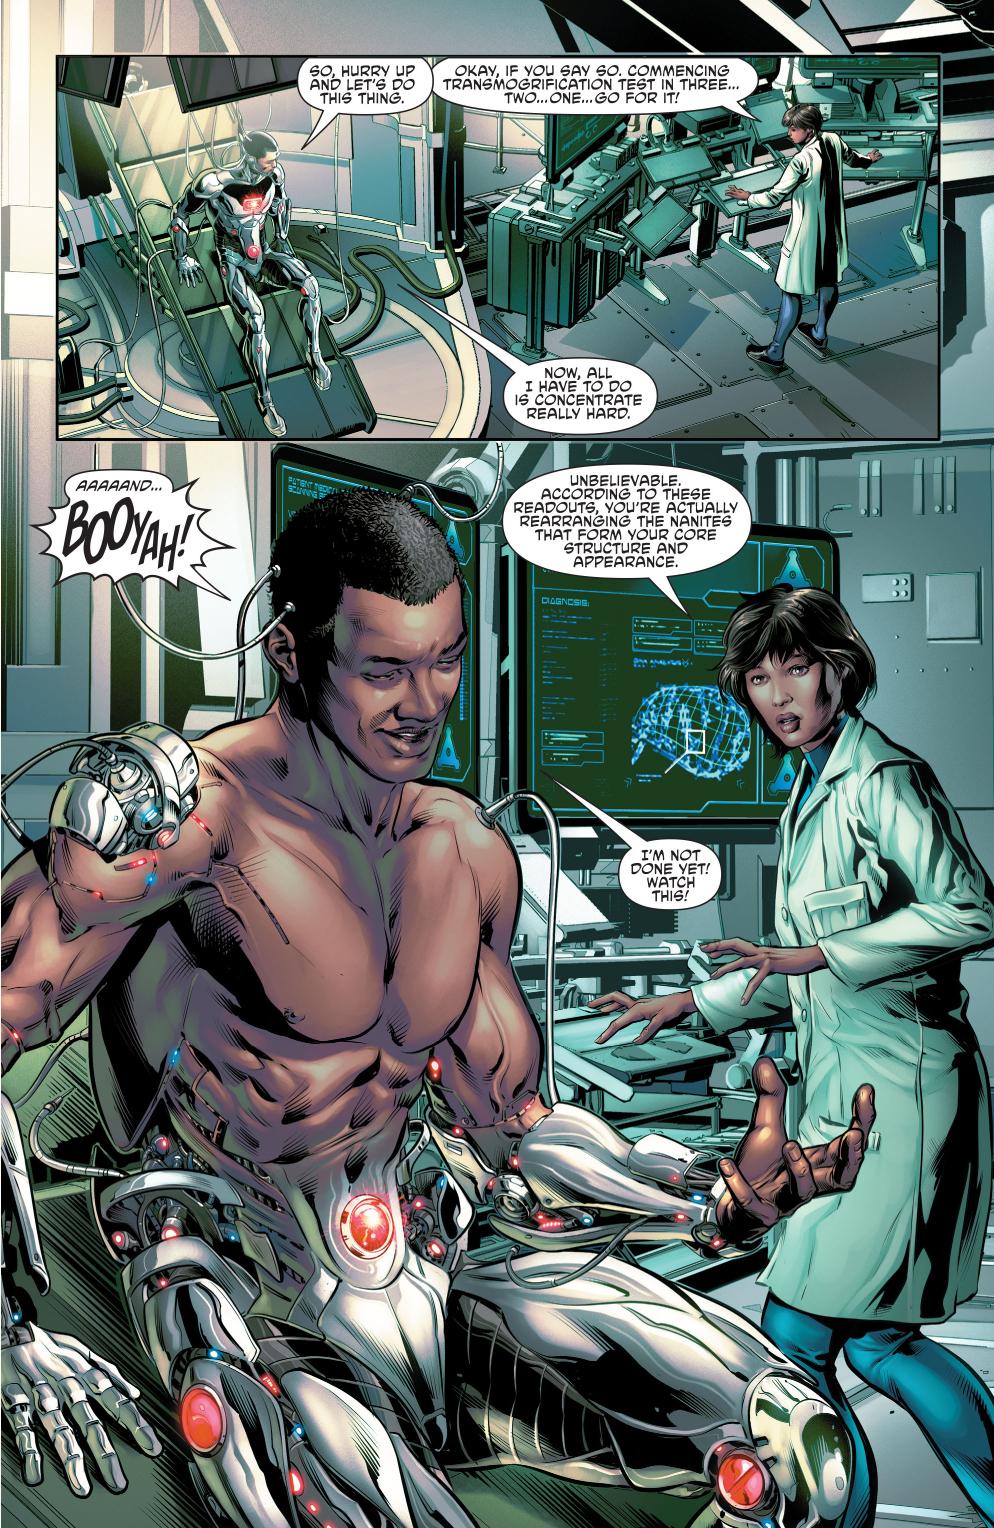 Cyborg's Transmogrification Power